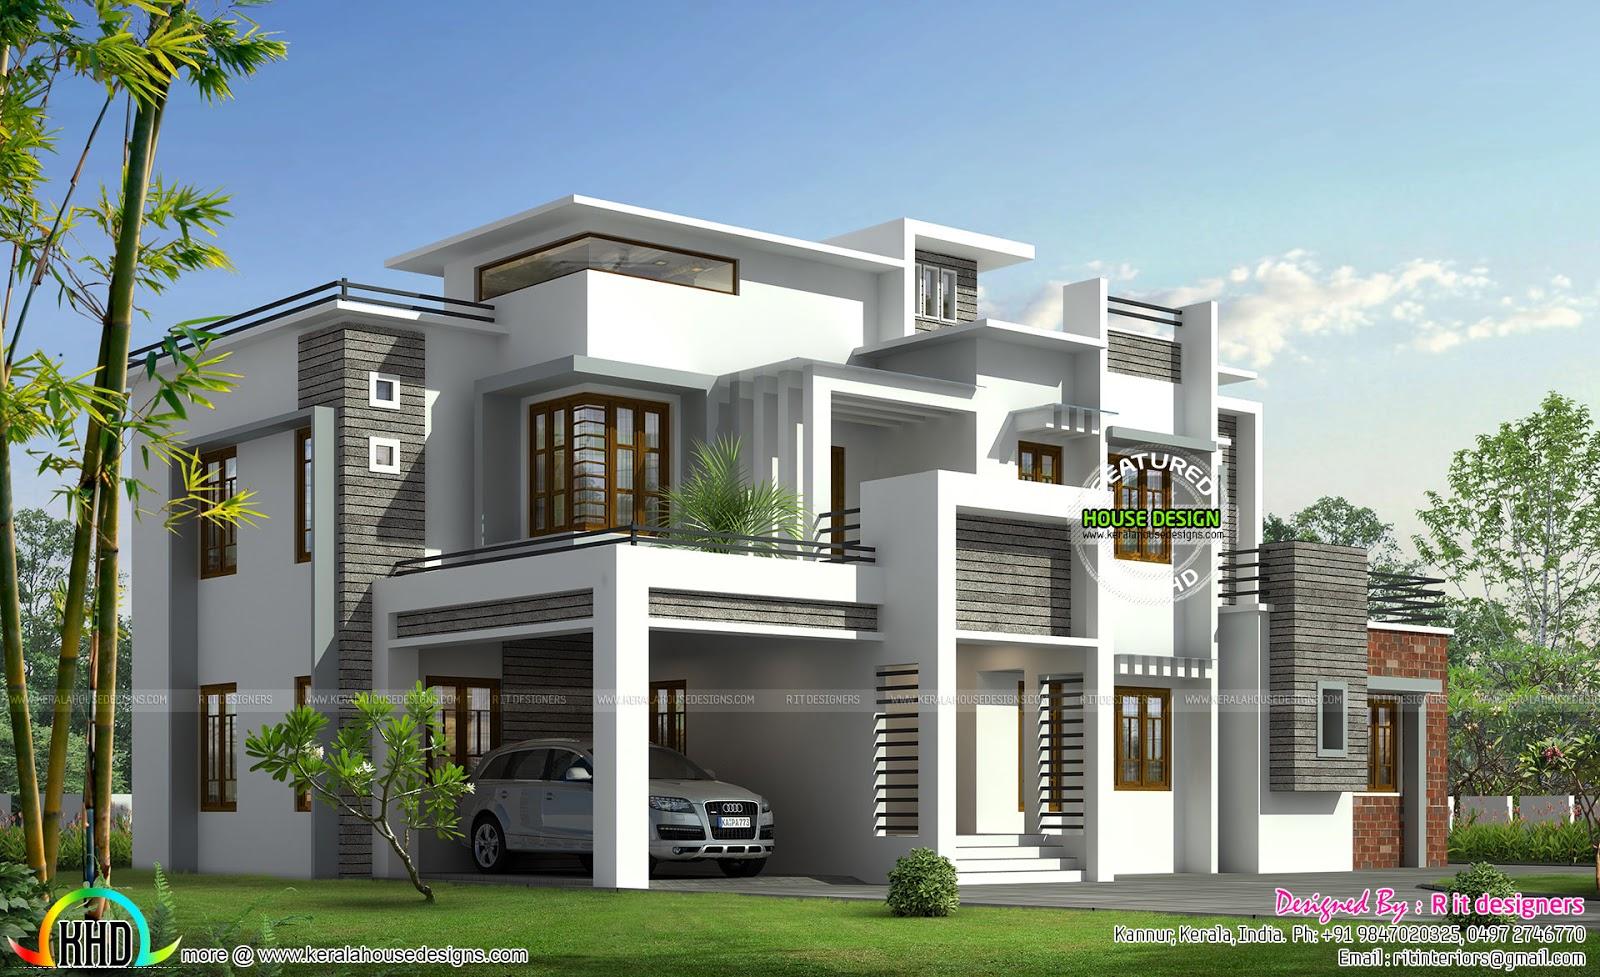 Box model contemporary house - Kerala home design and ...